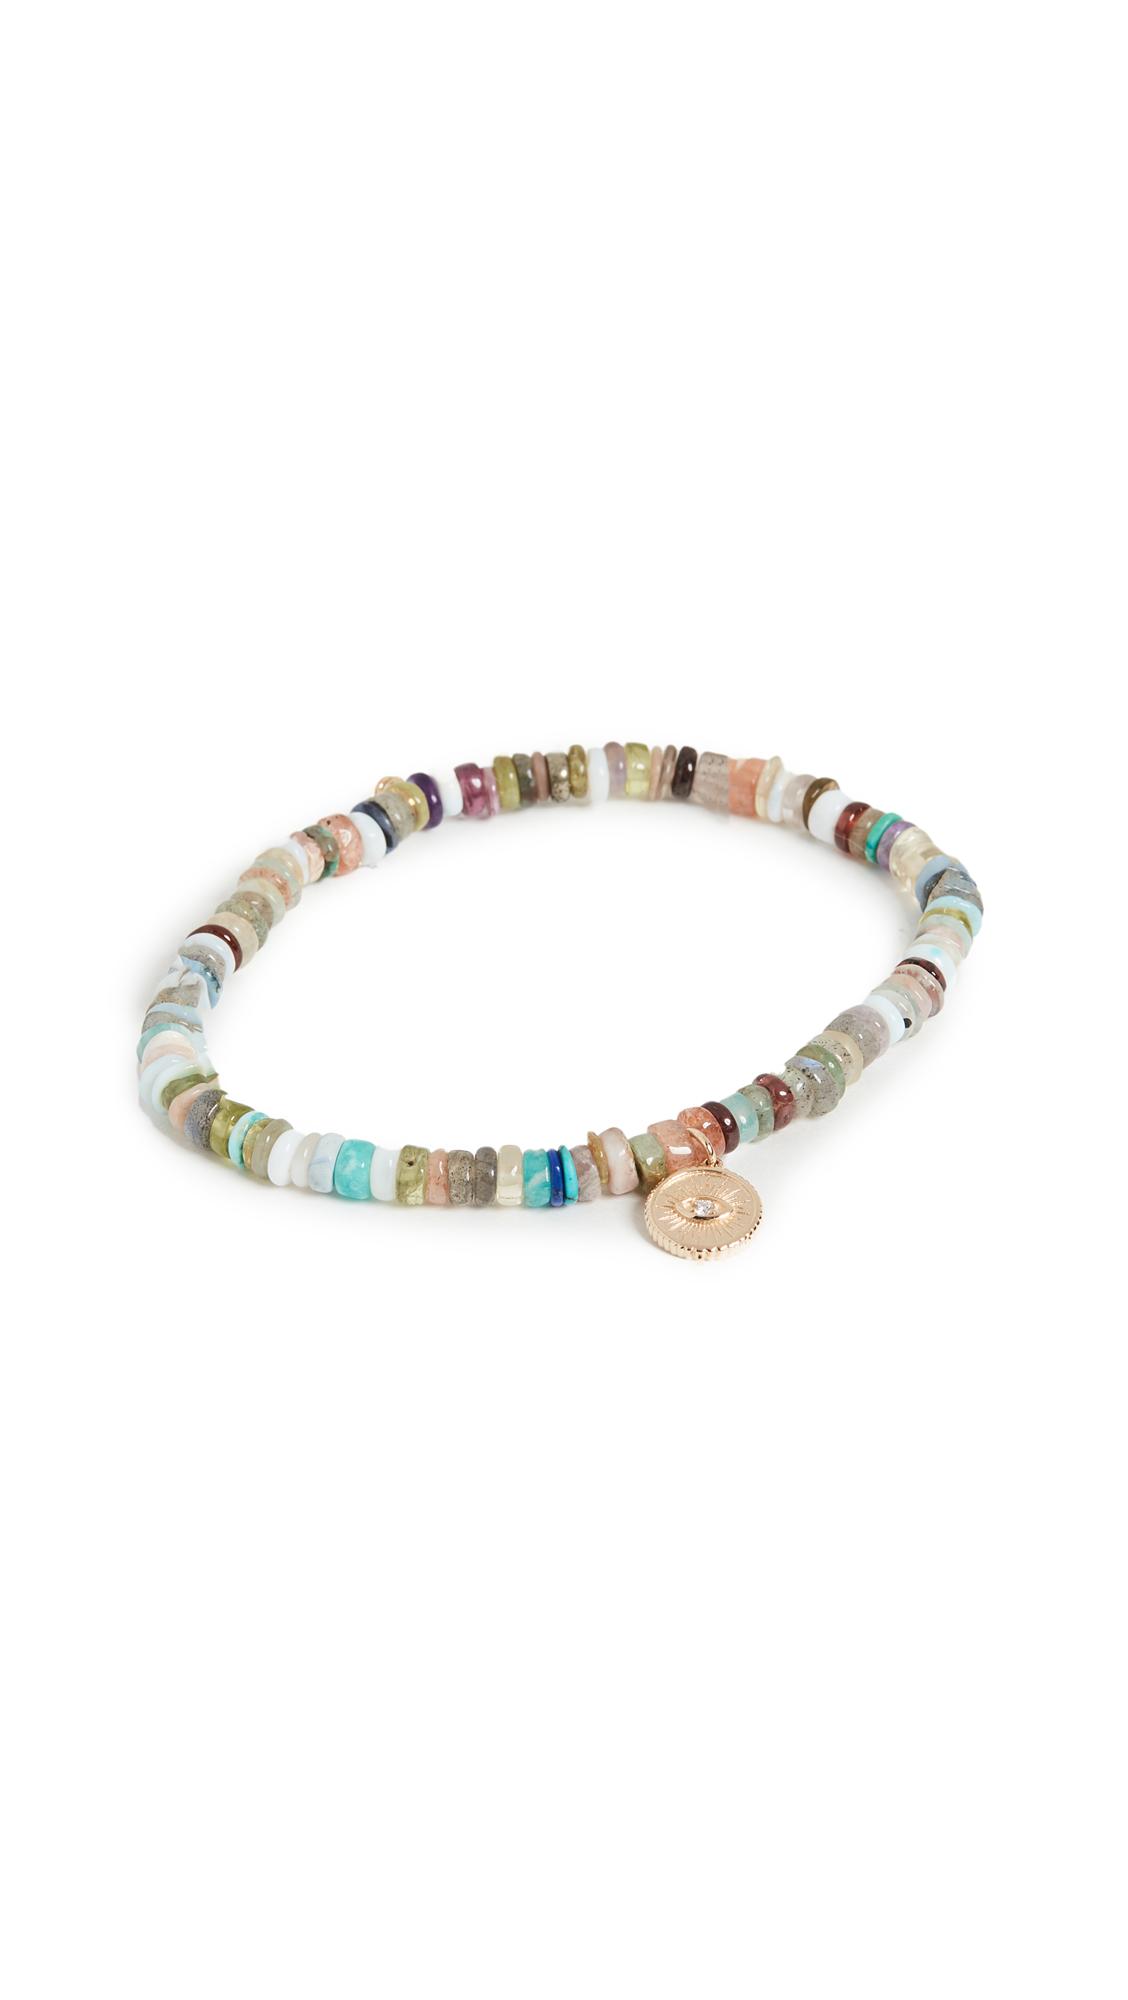 Sydney Evan Small Marquis Eye Coin Bracelet